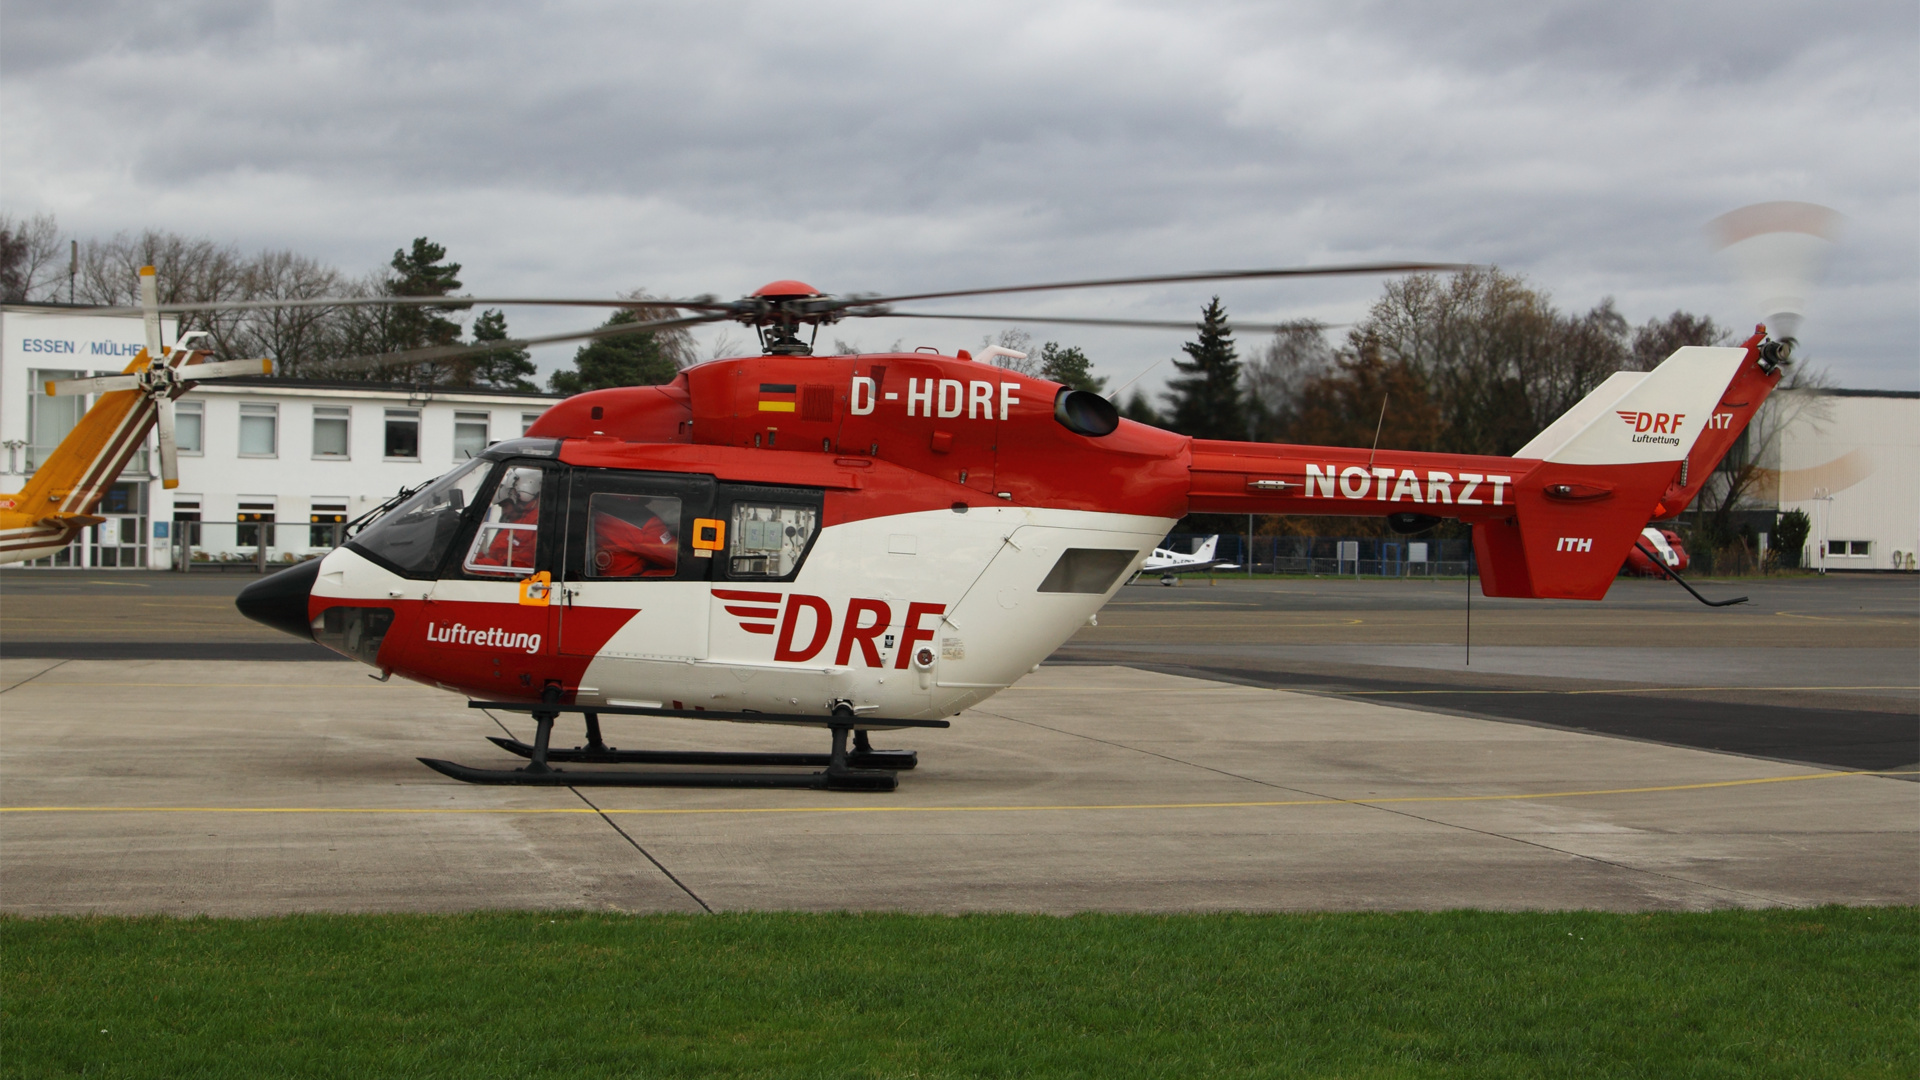 D-HDRF-1 BK117 ESS 200911